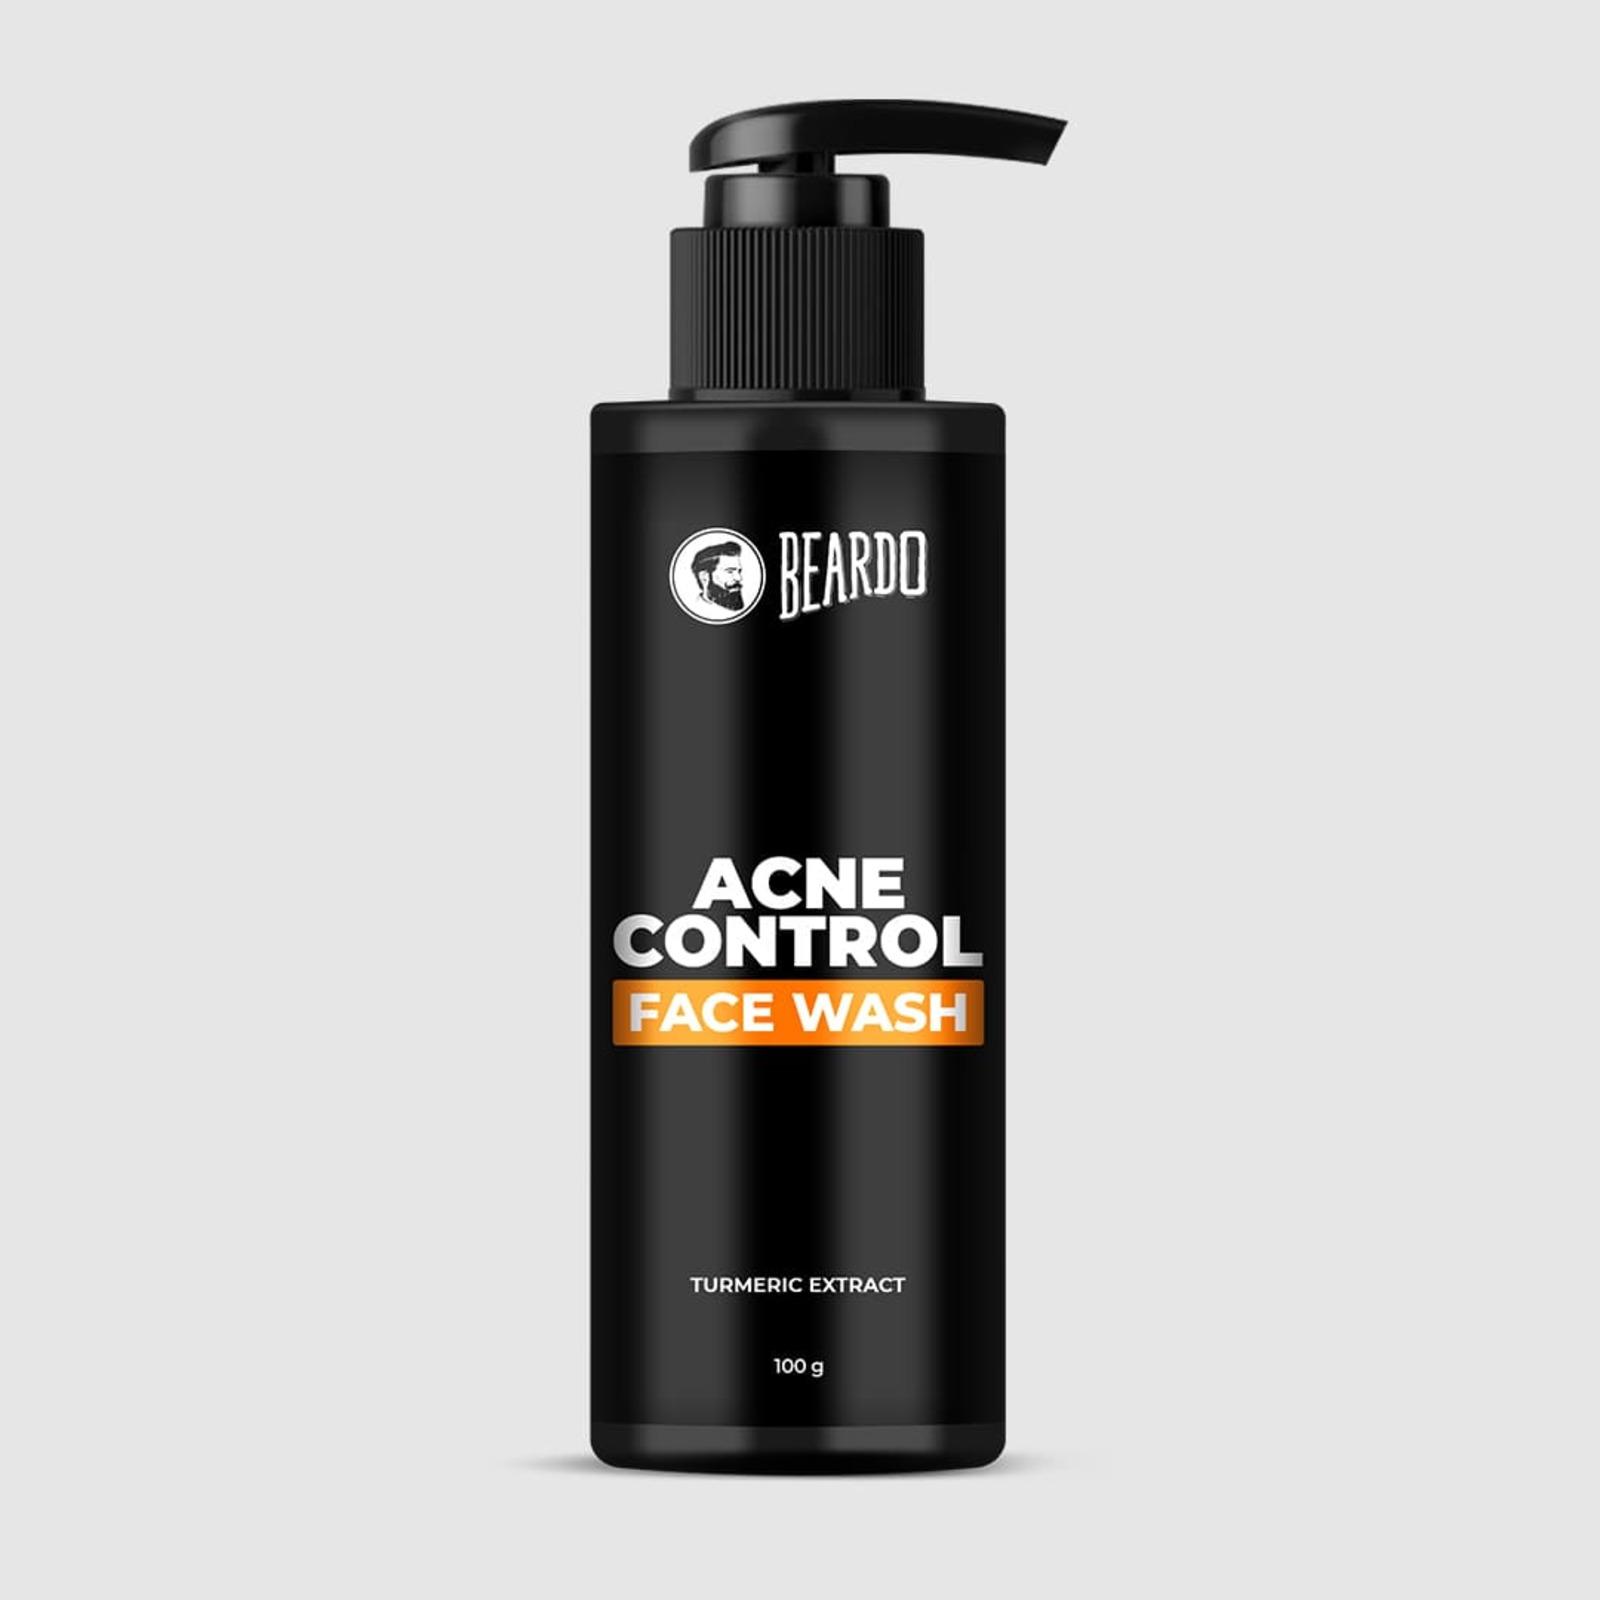 Beardo Acne Control Facewash (100g)